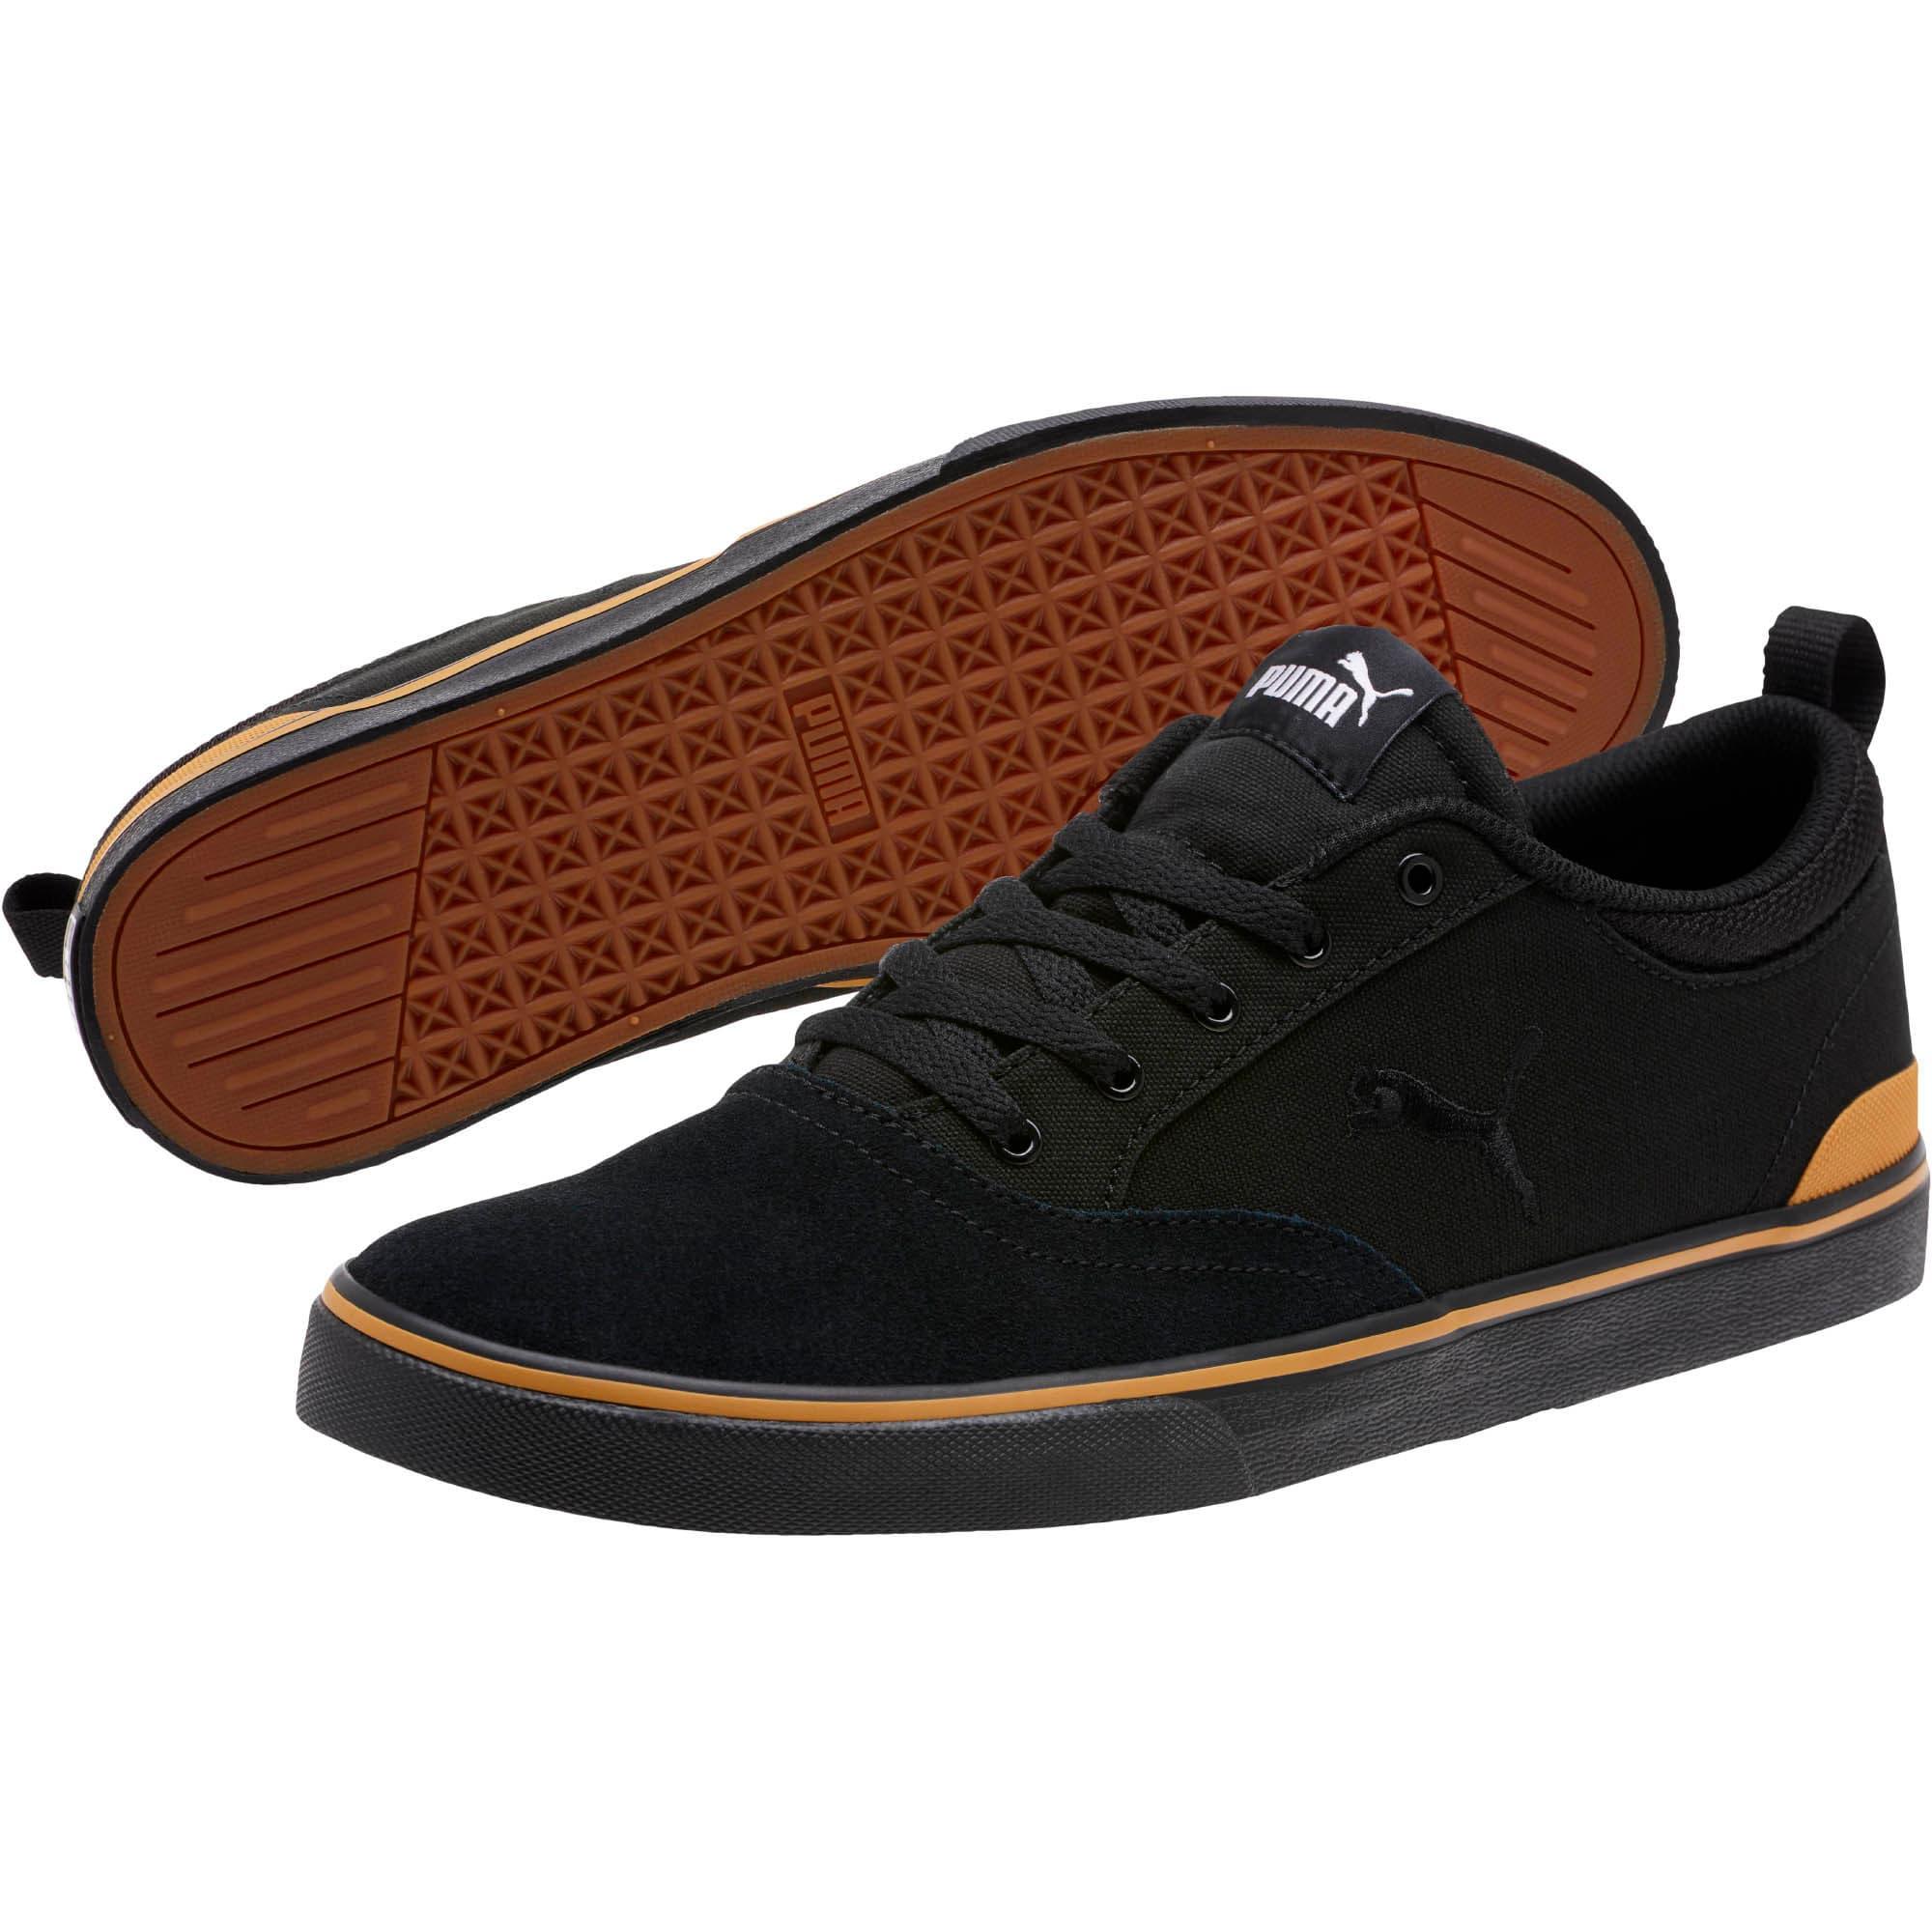 Thumbnail 2 of Puma Bridger Cat Men's Sneakers, Puma Black-Asphalt, medium